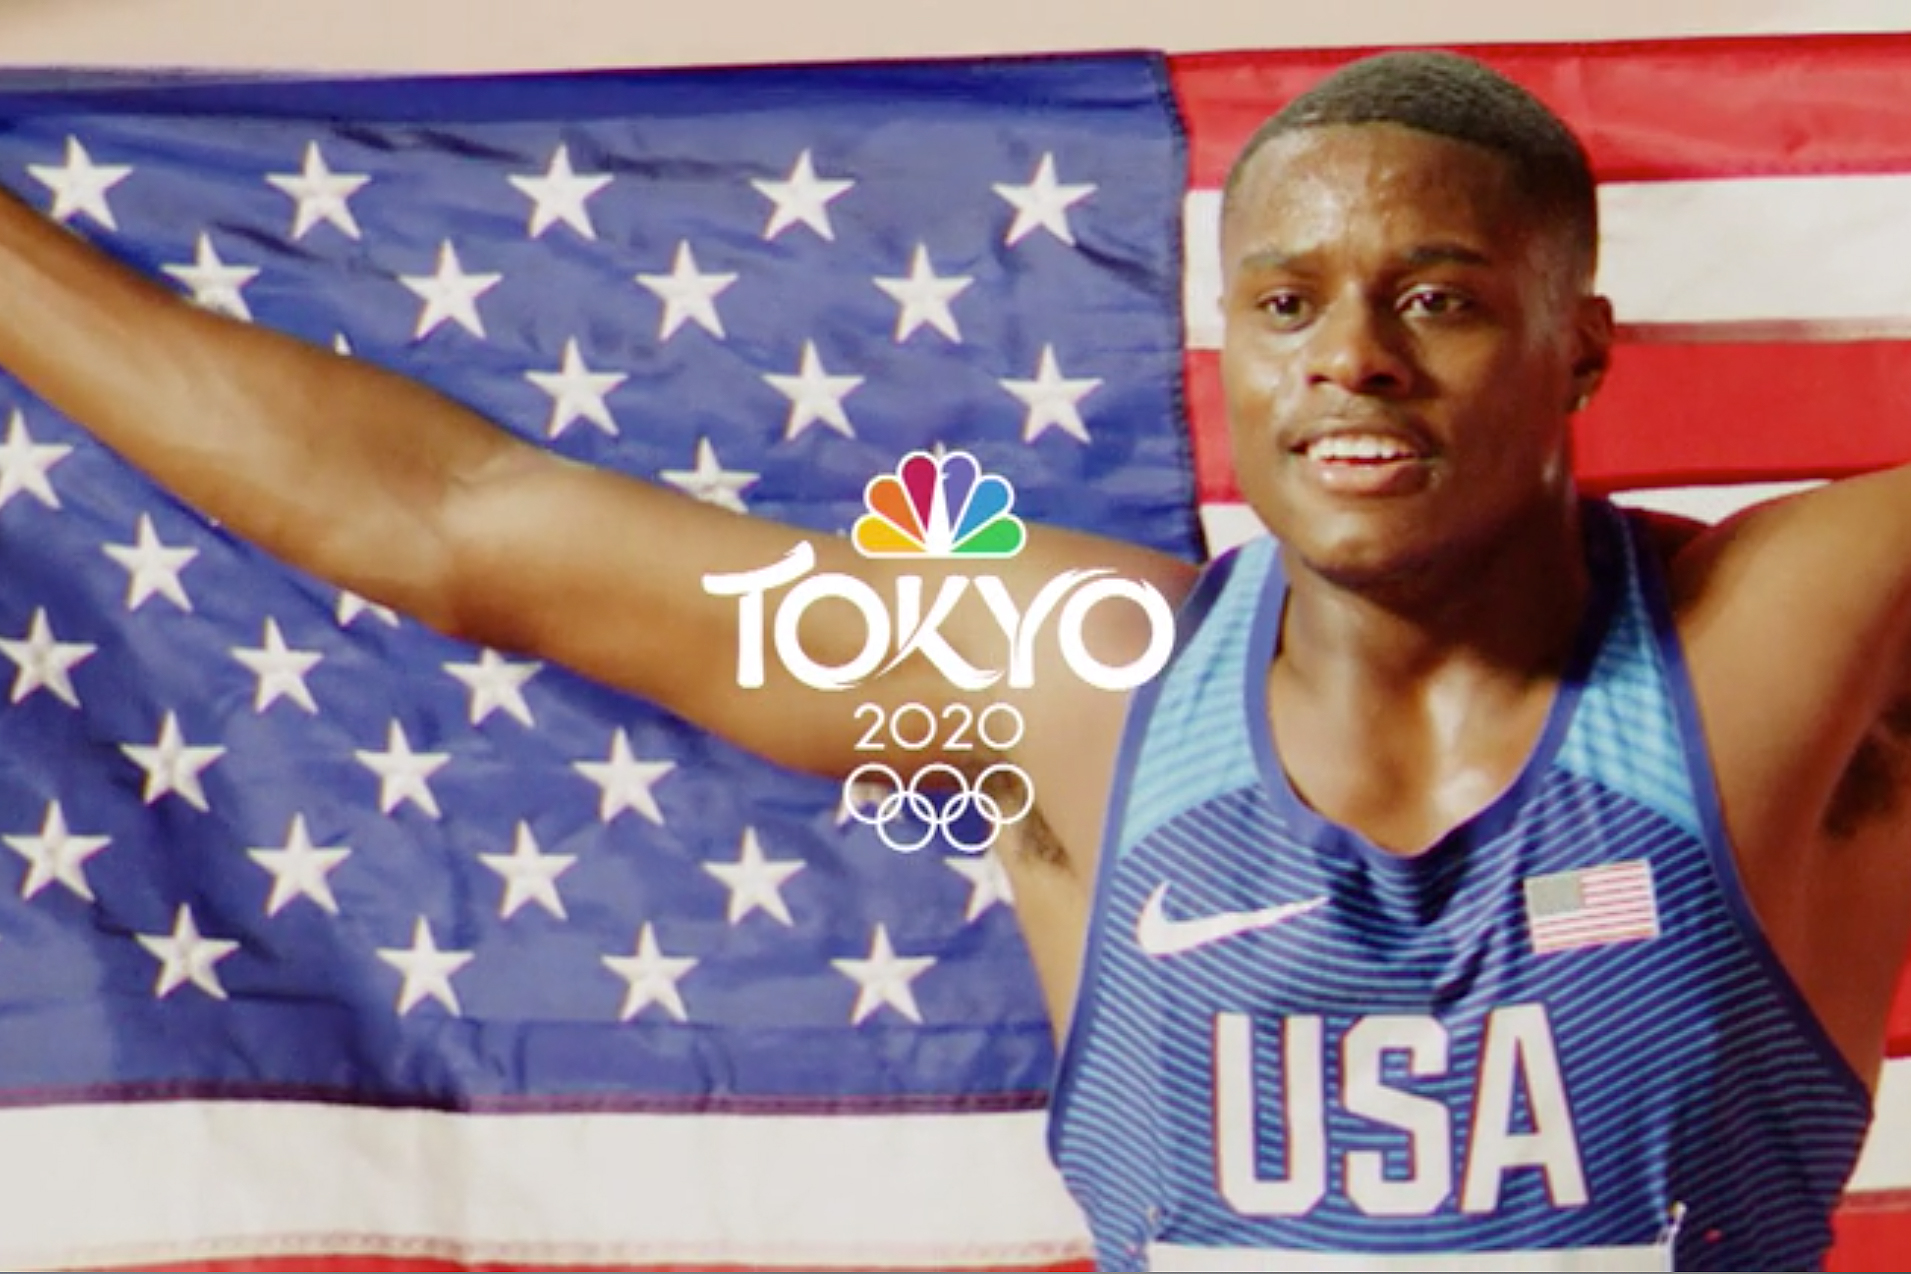 2020 Summer Olympics NFL NBC Sports Sunday Night Football